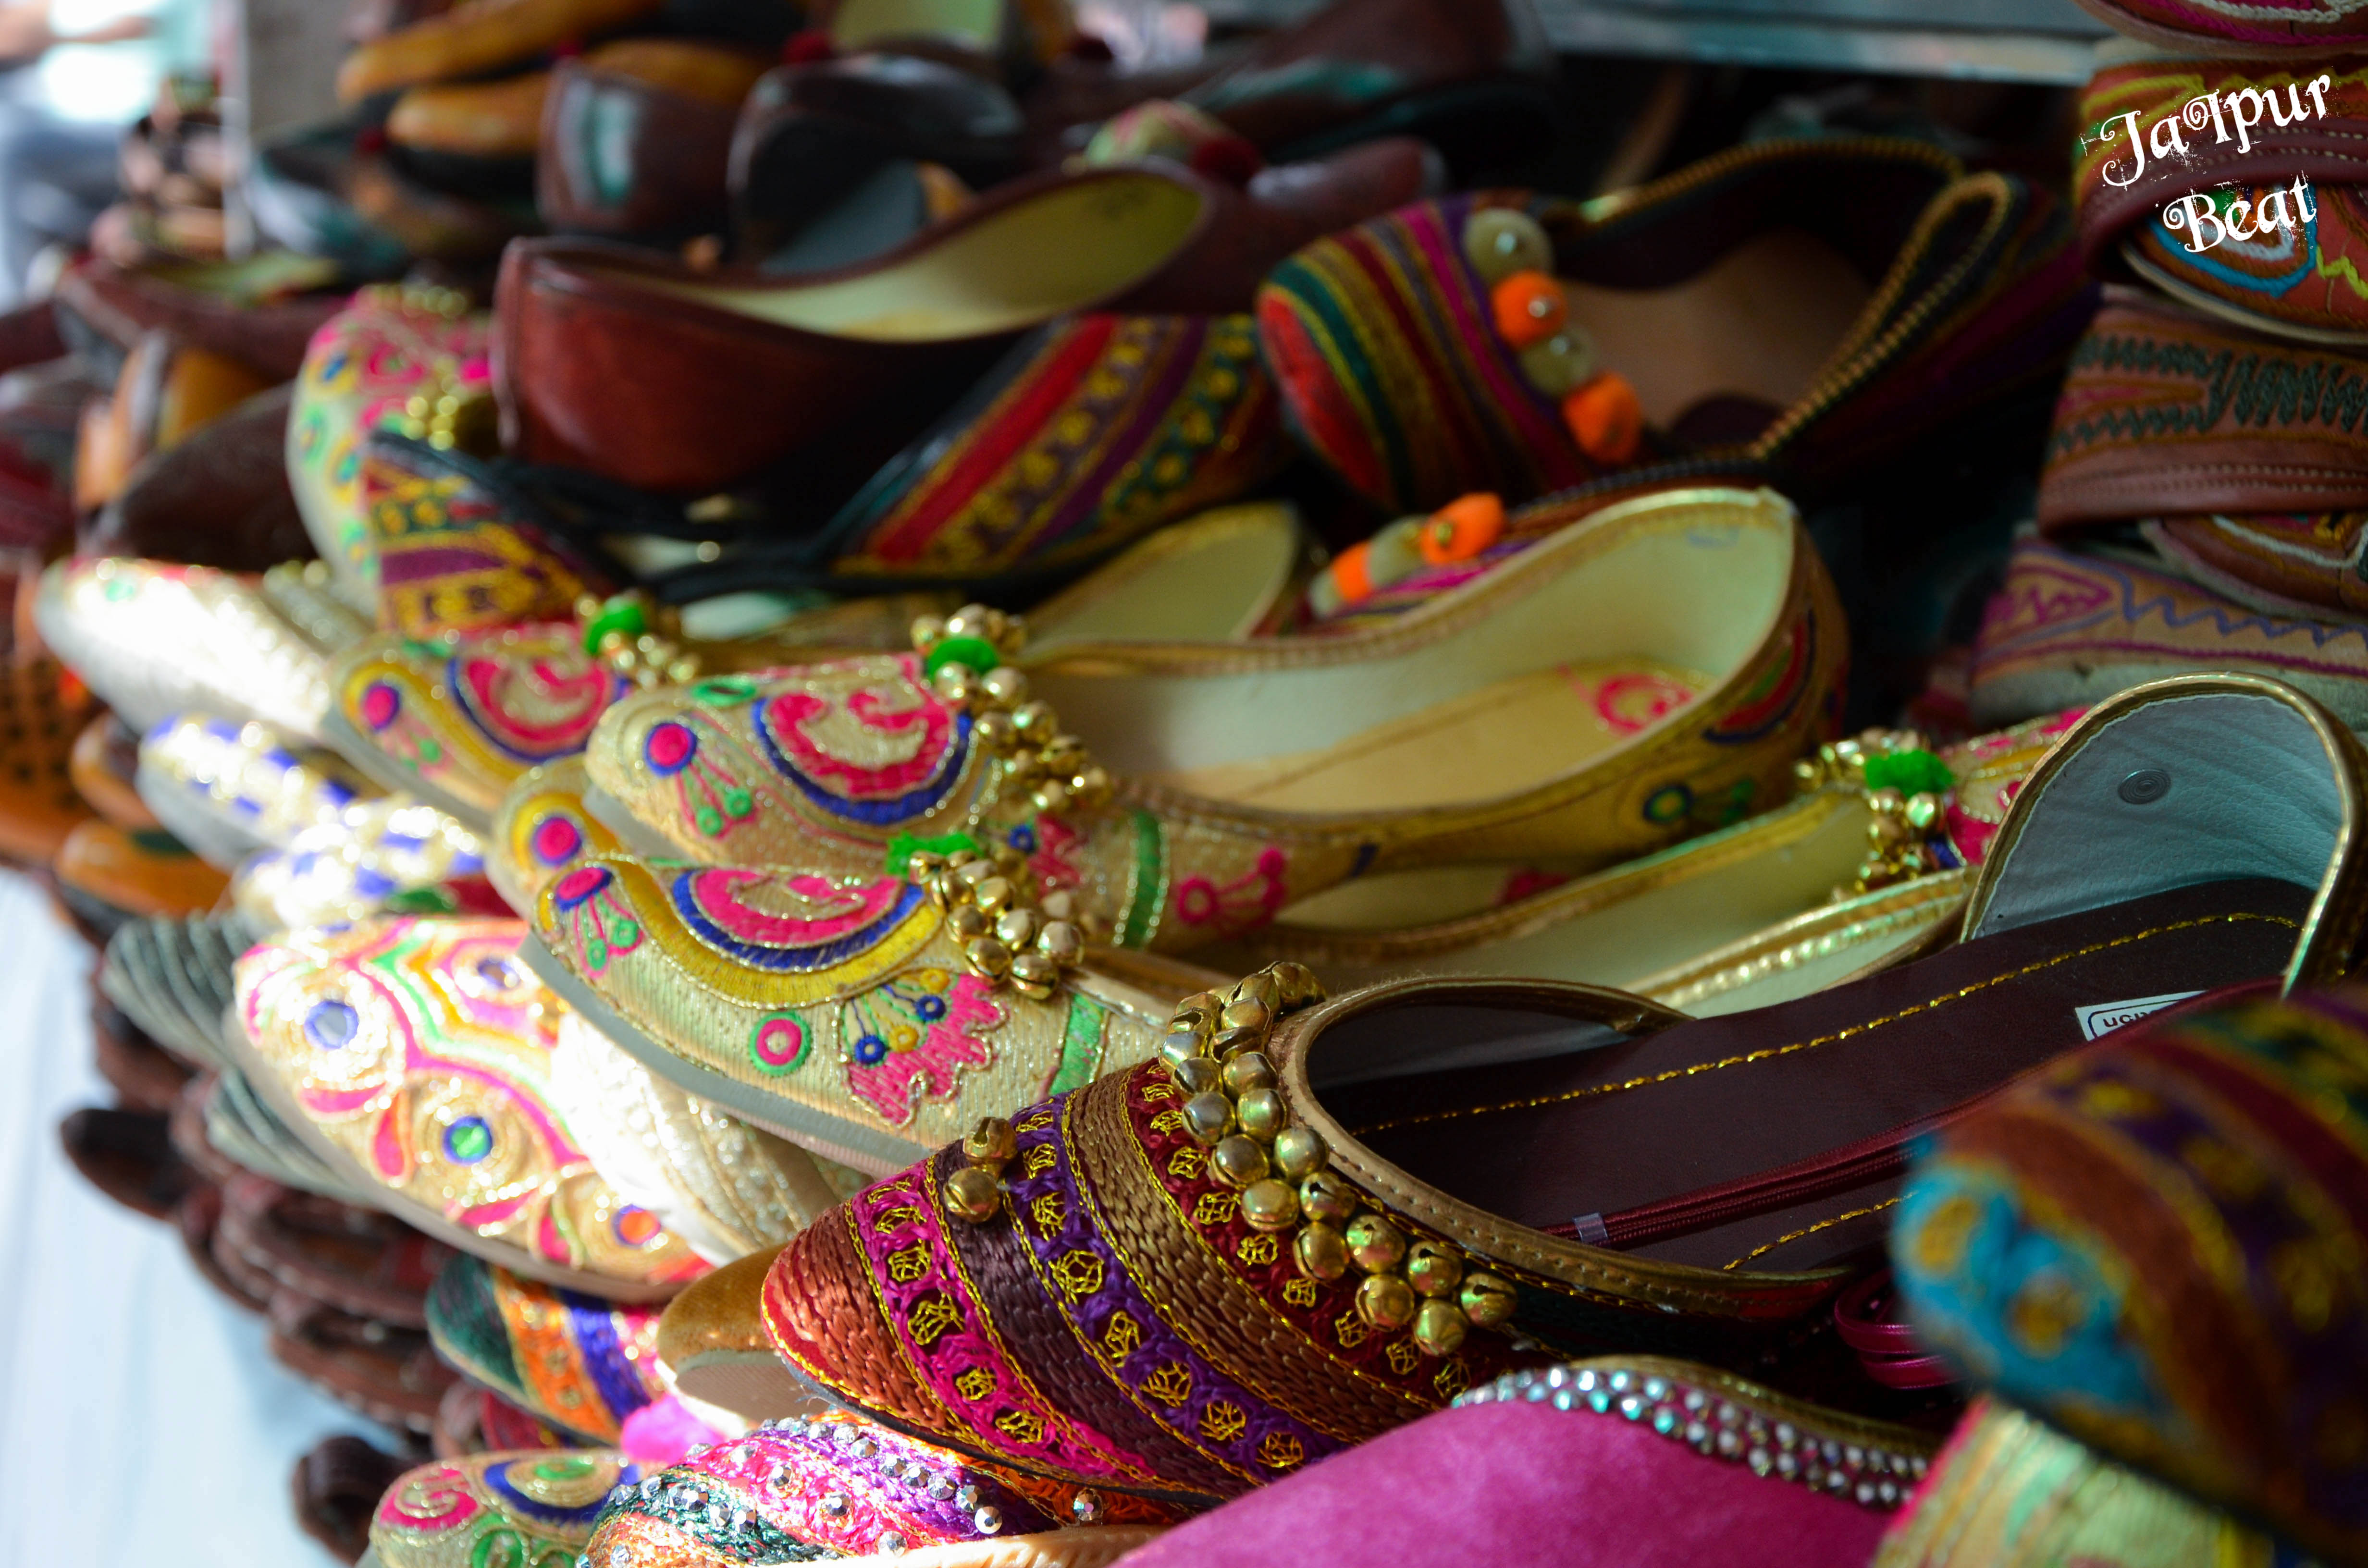 Bapu Bazaar by Jaipur Beat Jutis